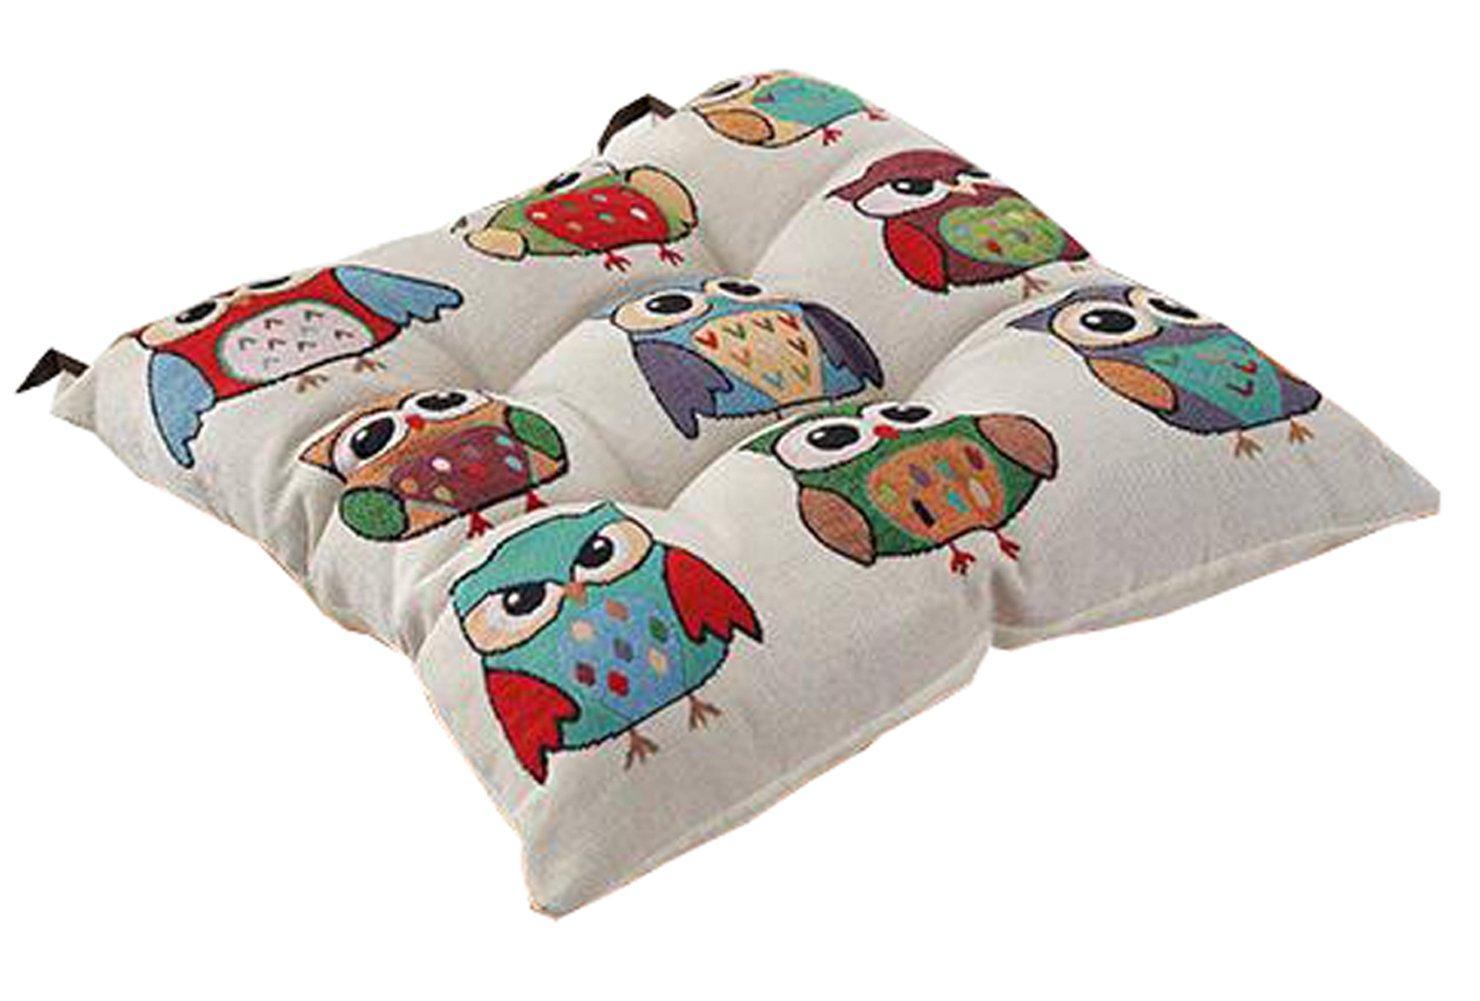 Peacewish Thicker PP Cotton Non-slip Seat Cushion Cute Animal Chair Pad Home Office Car Cushion Containing Straps (Expression)